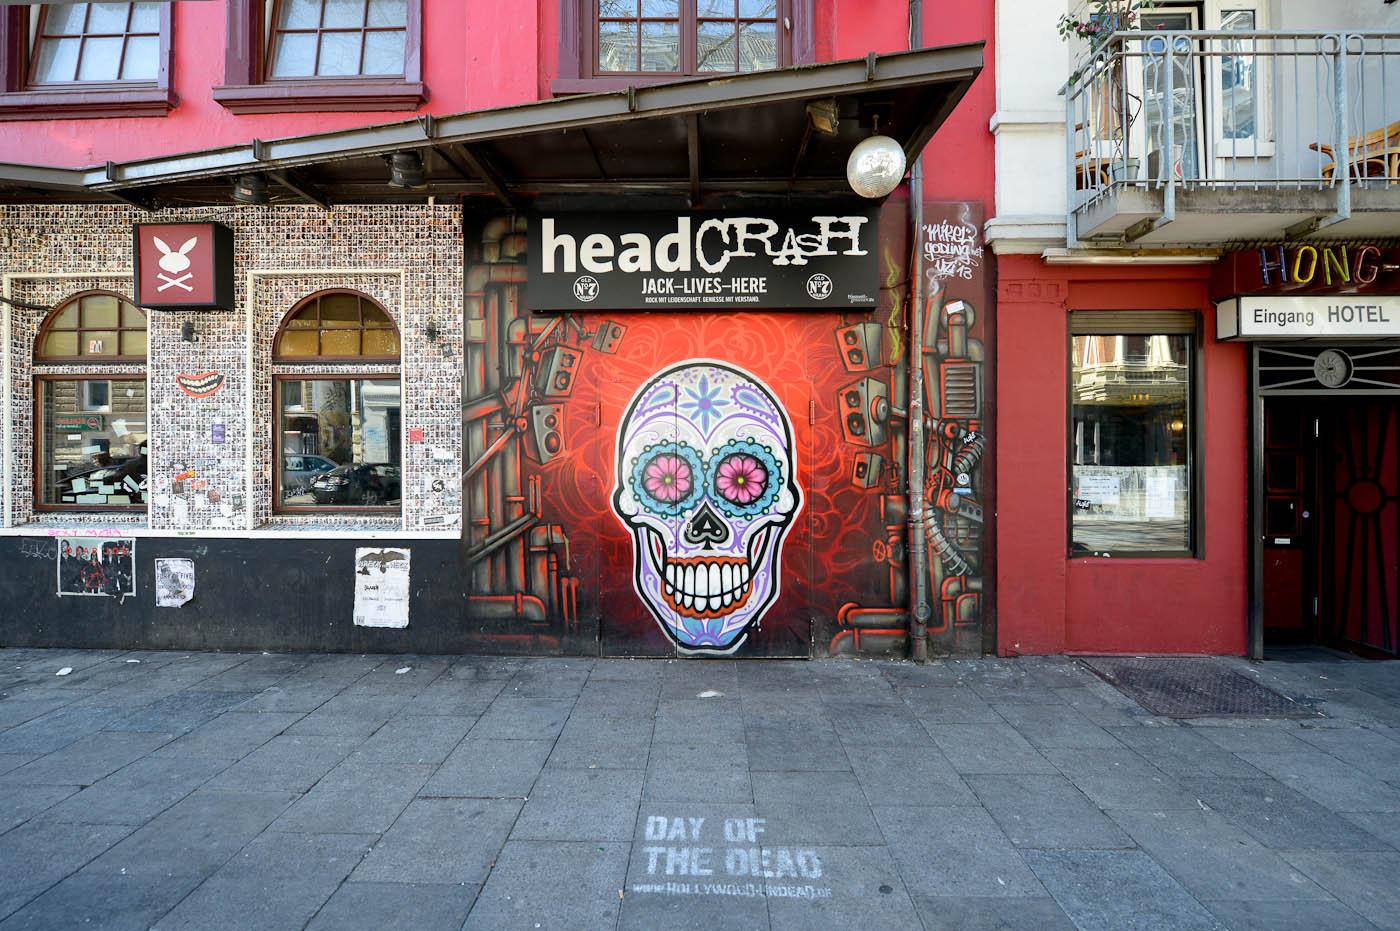 Foto ID 2015040102 Club & Disco, HeadCRASH